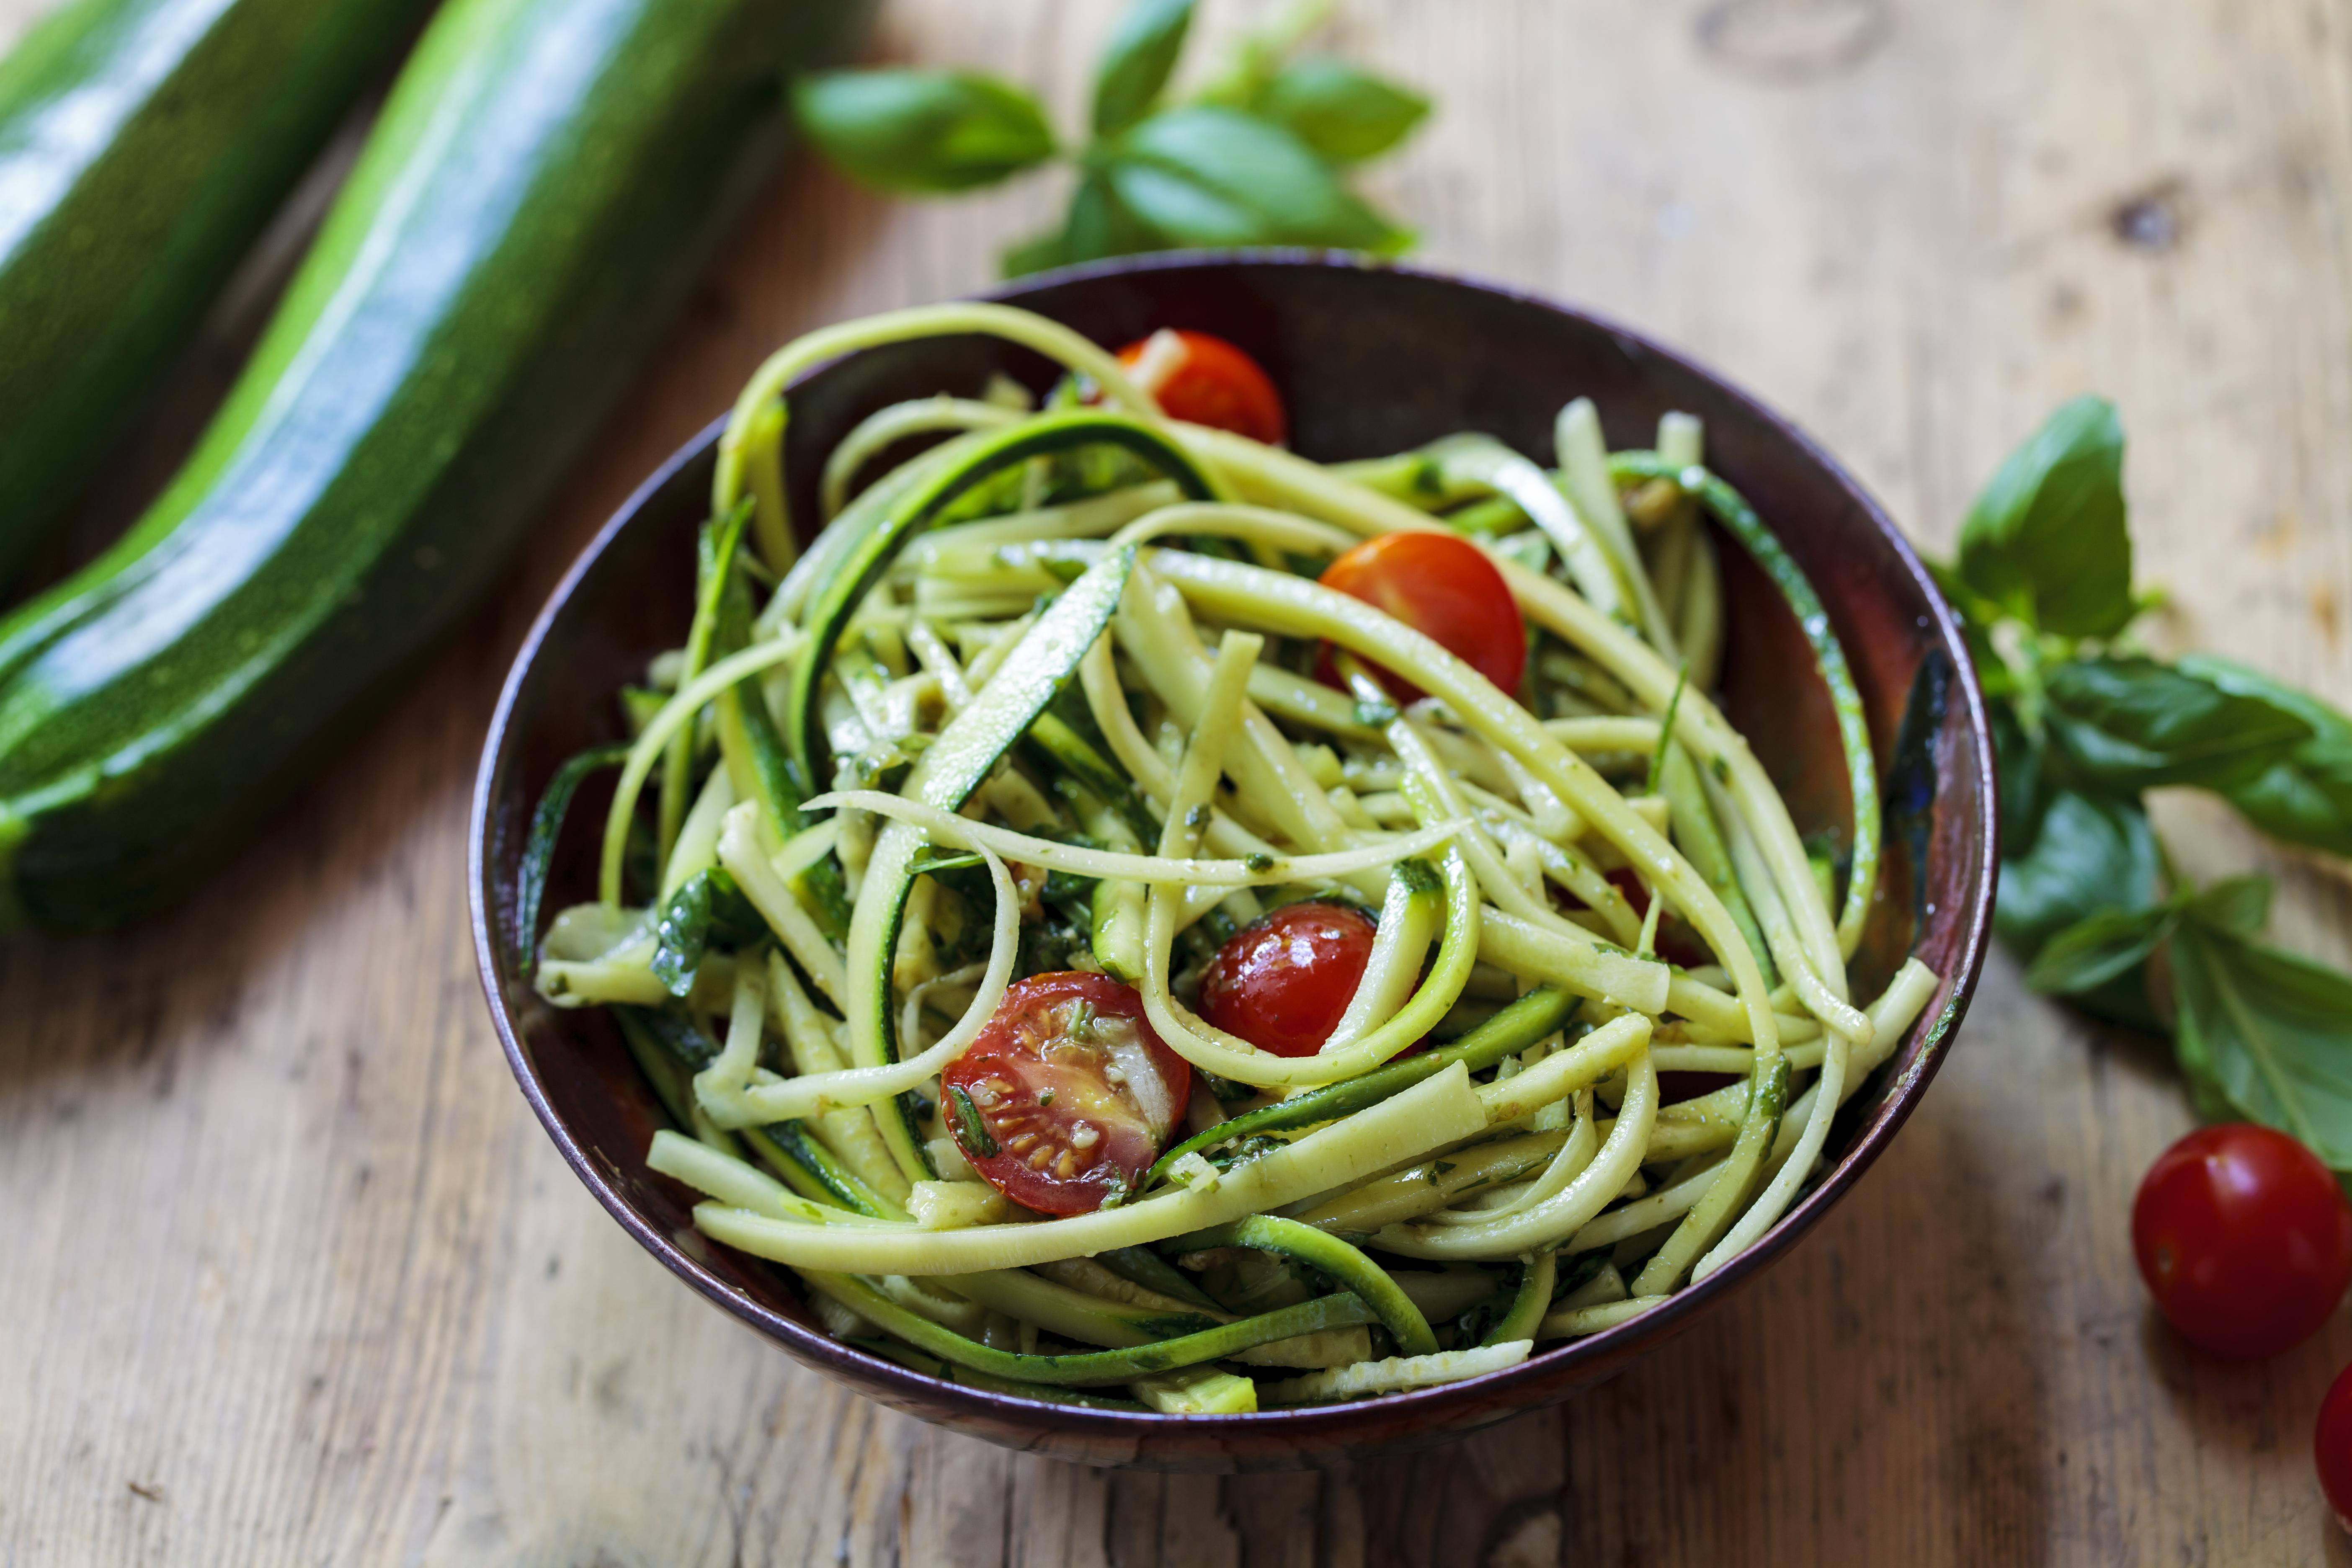 Zucchini spaghetti with rough basil and